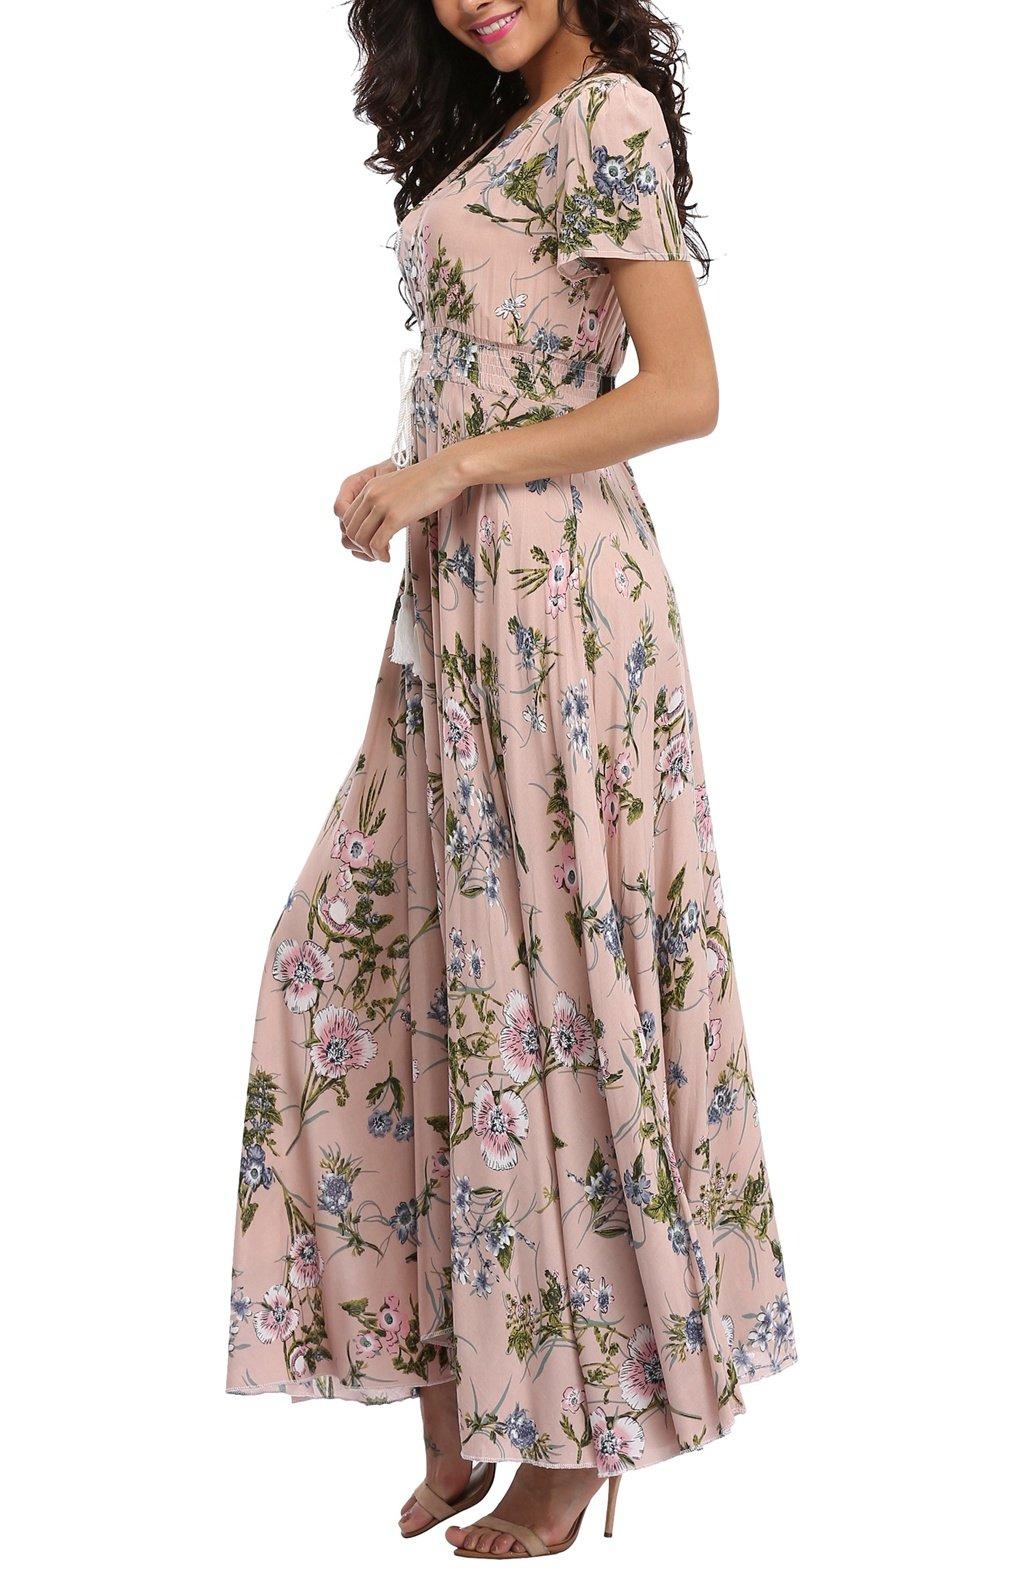 VintageClothing Women's Floral Print Maxi Dresses Boho Button Up Split Beach Party Dress,Pale Dogwood,Large by VintageClothing (Image #3)